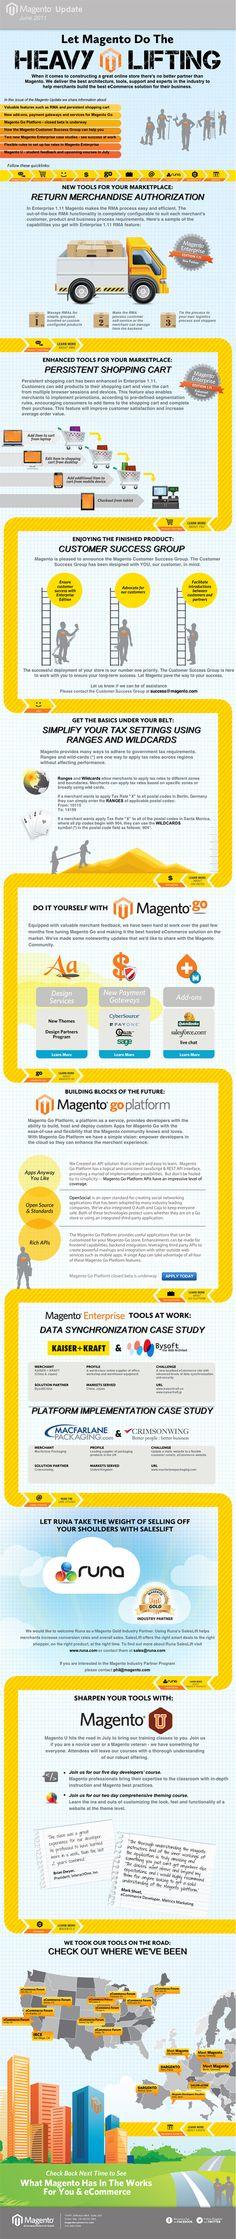 Magento June Infographic